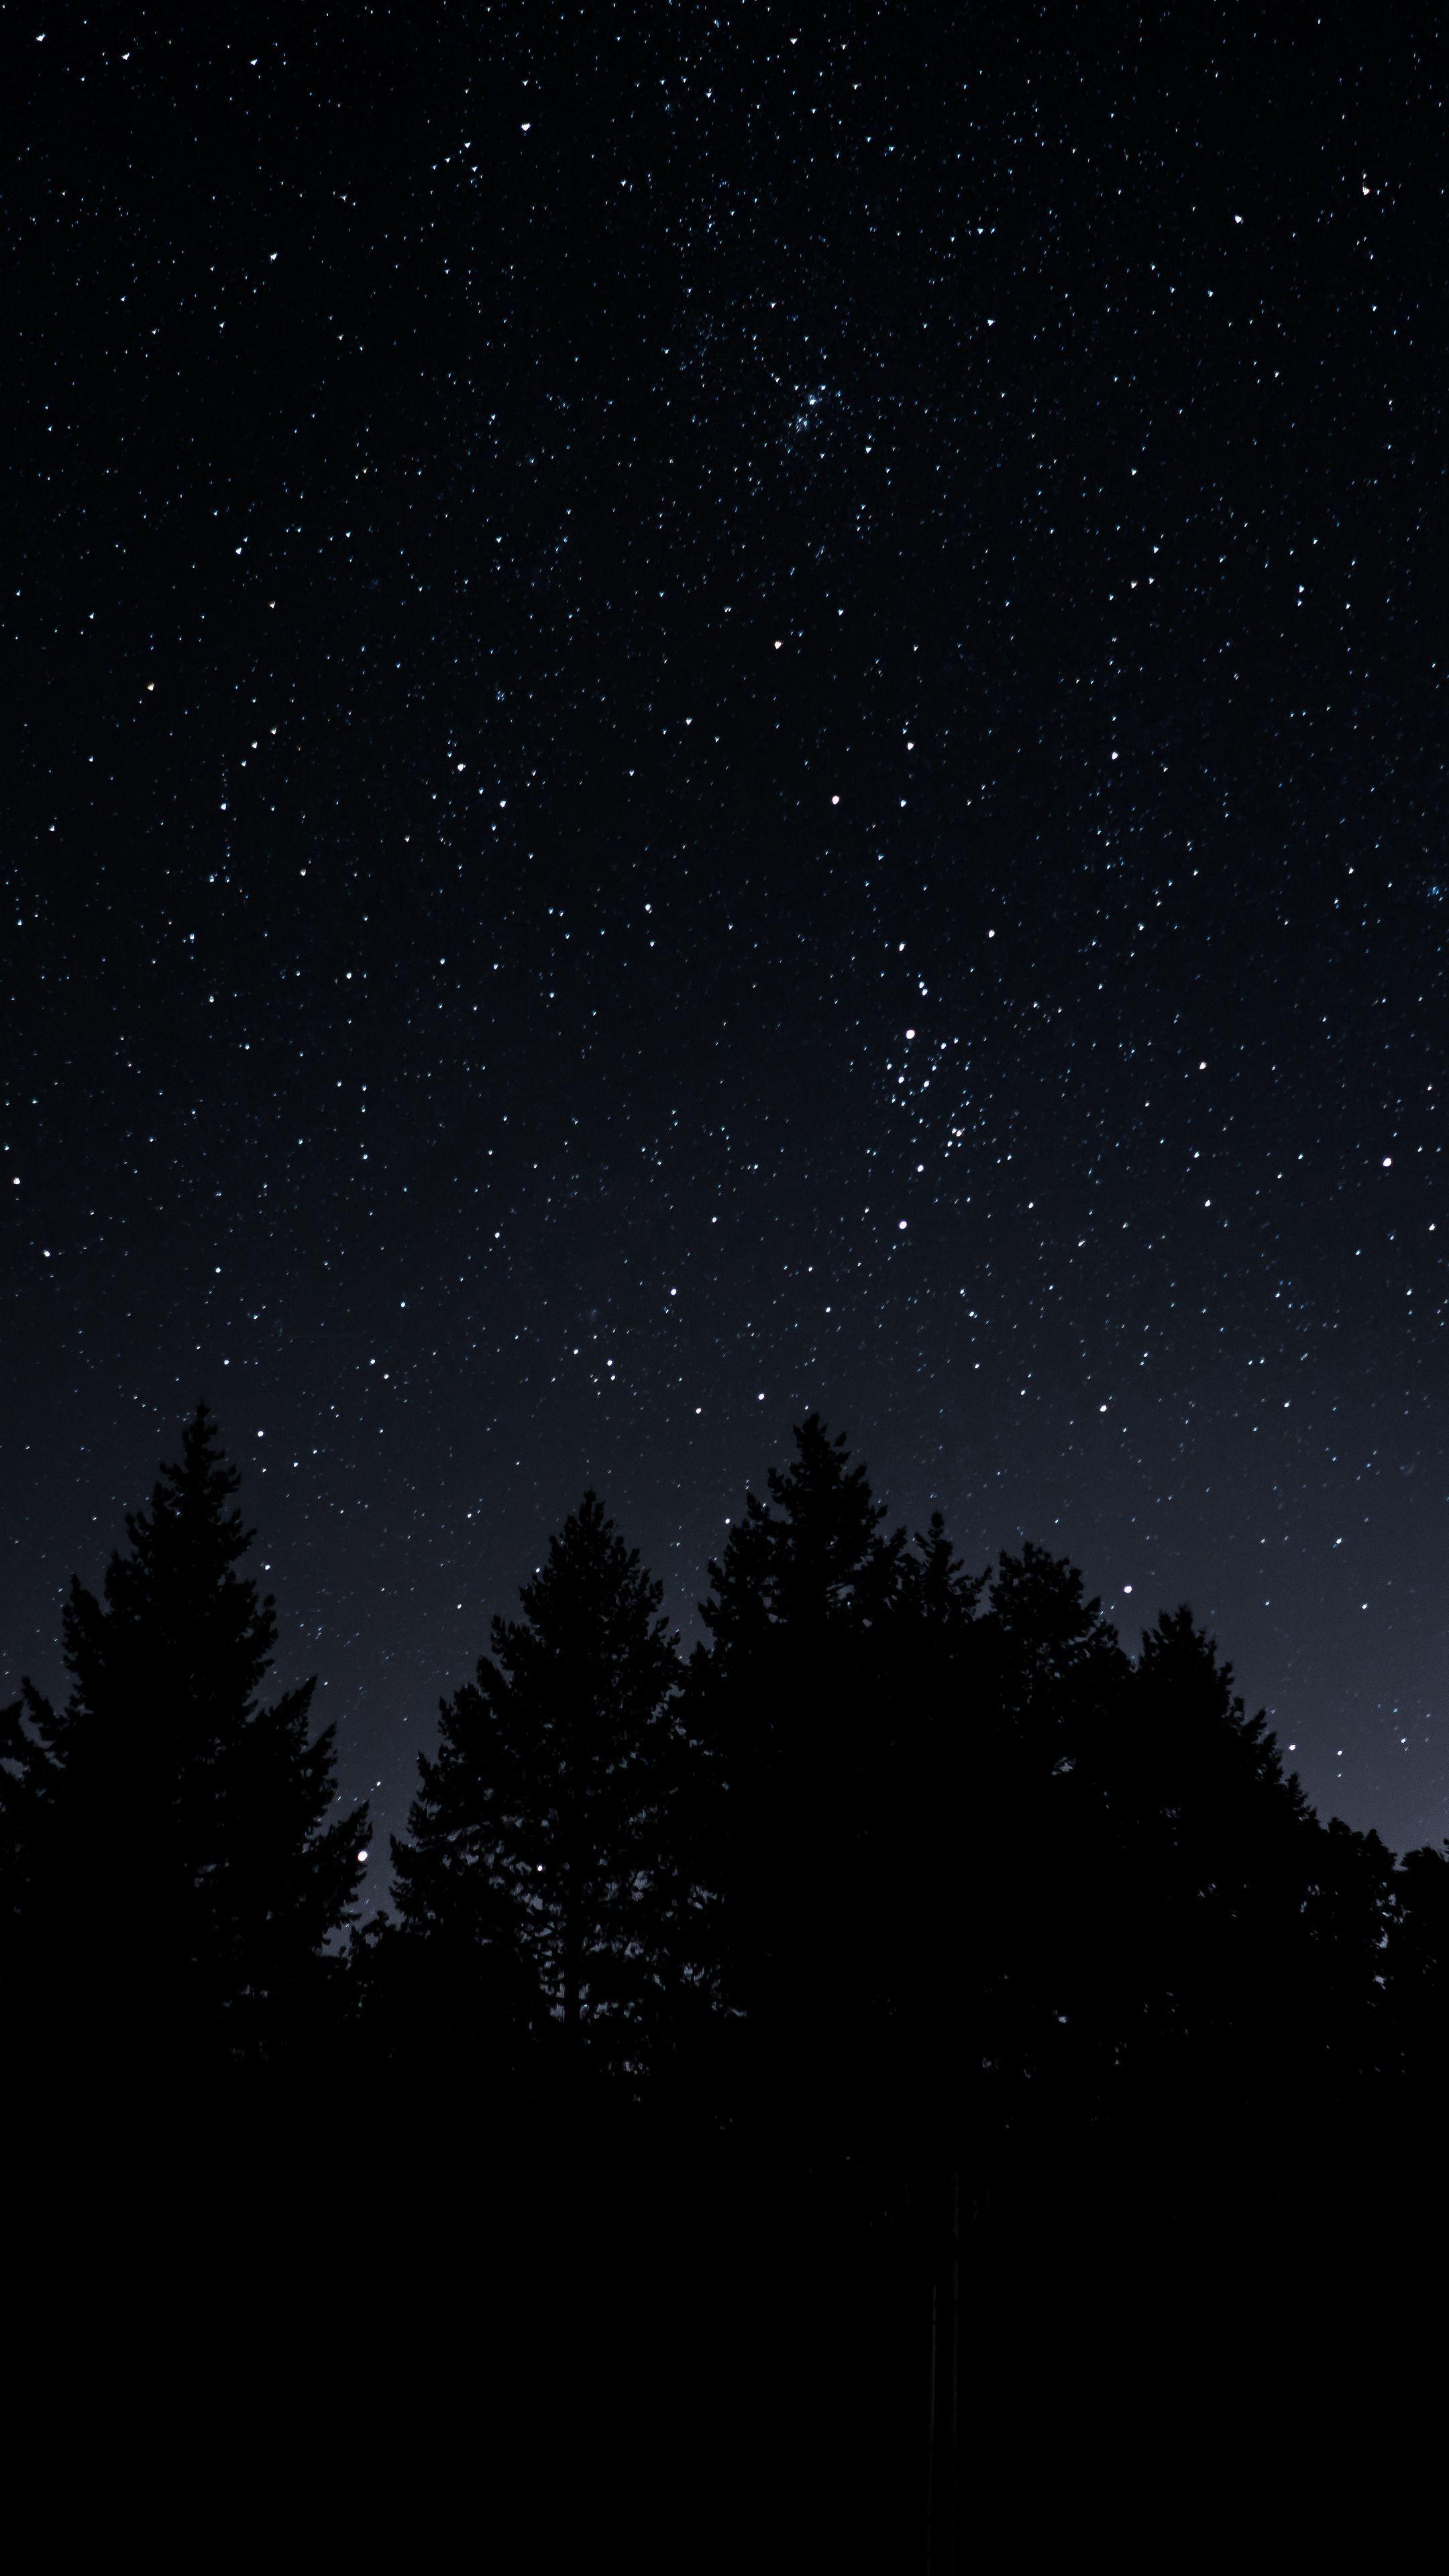 Sky starrysky trees night wallpapers hd 4k background